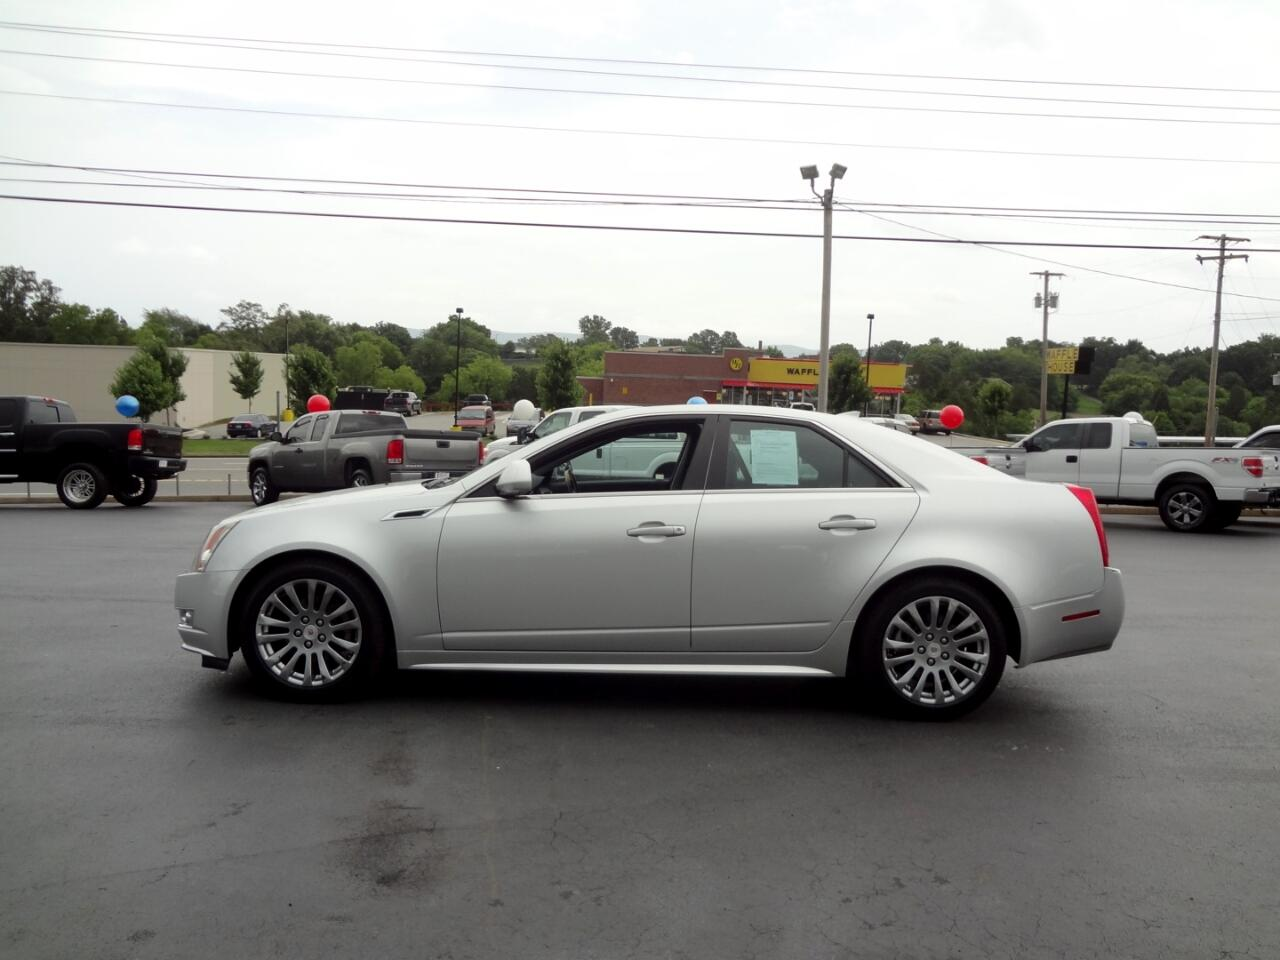 Cadillac CTS Sedan 4dr Sdn 3.6L Performance RWD 2012